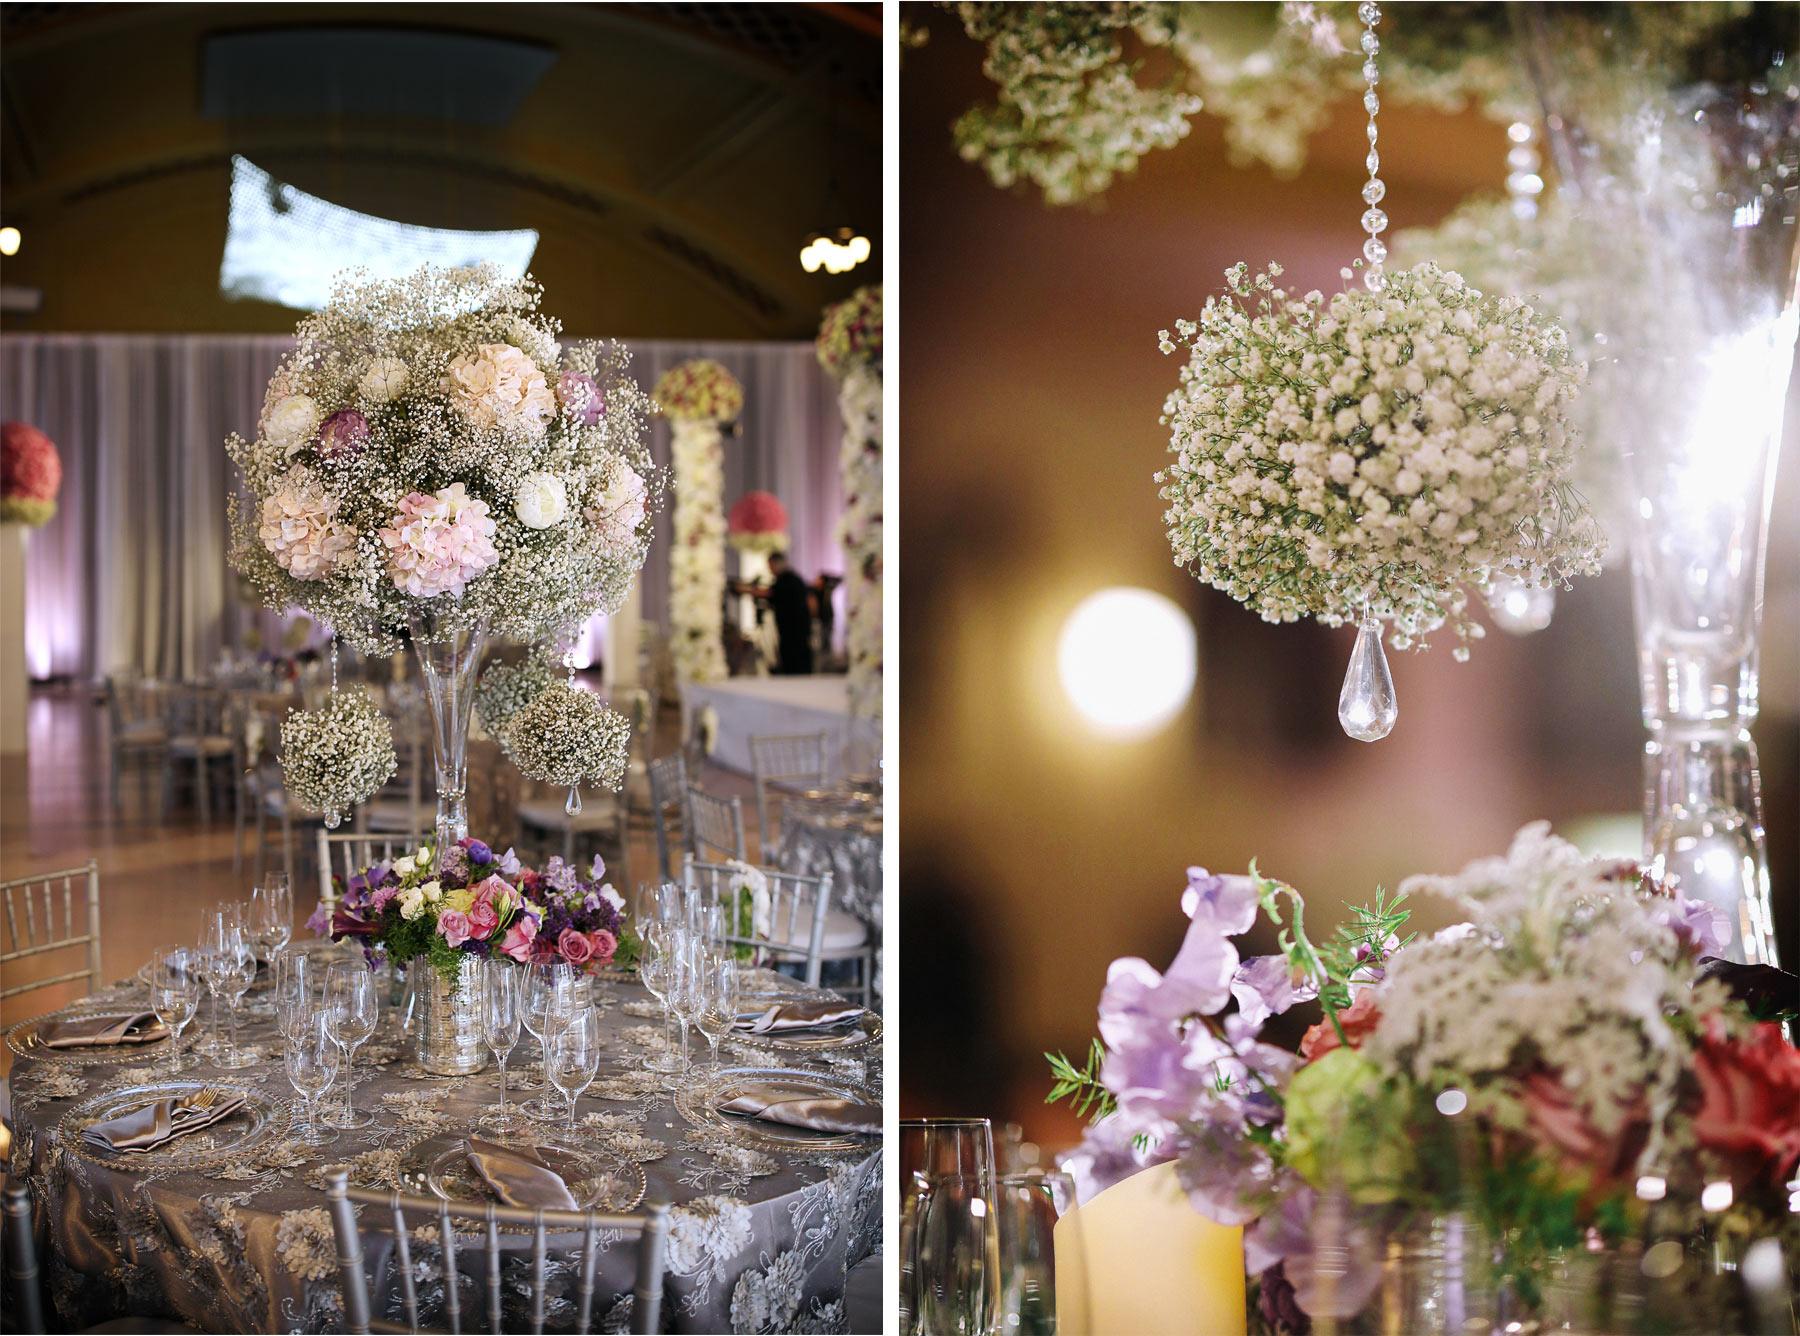 09-Andrew-Vick-Photography-My-Great-Big-Live-Wedding-with-David-Tutera-Behind-the-Scenes-Minnesota-Union-Depot-Saint-Paul-Flowers-Flower-Table-Setting.jpg